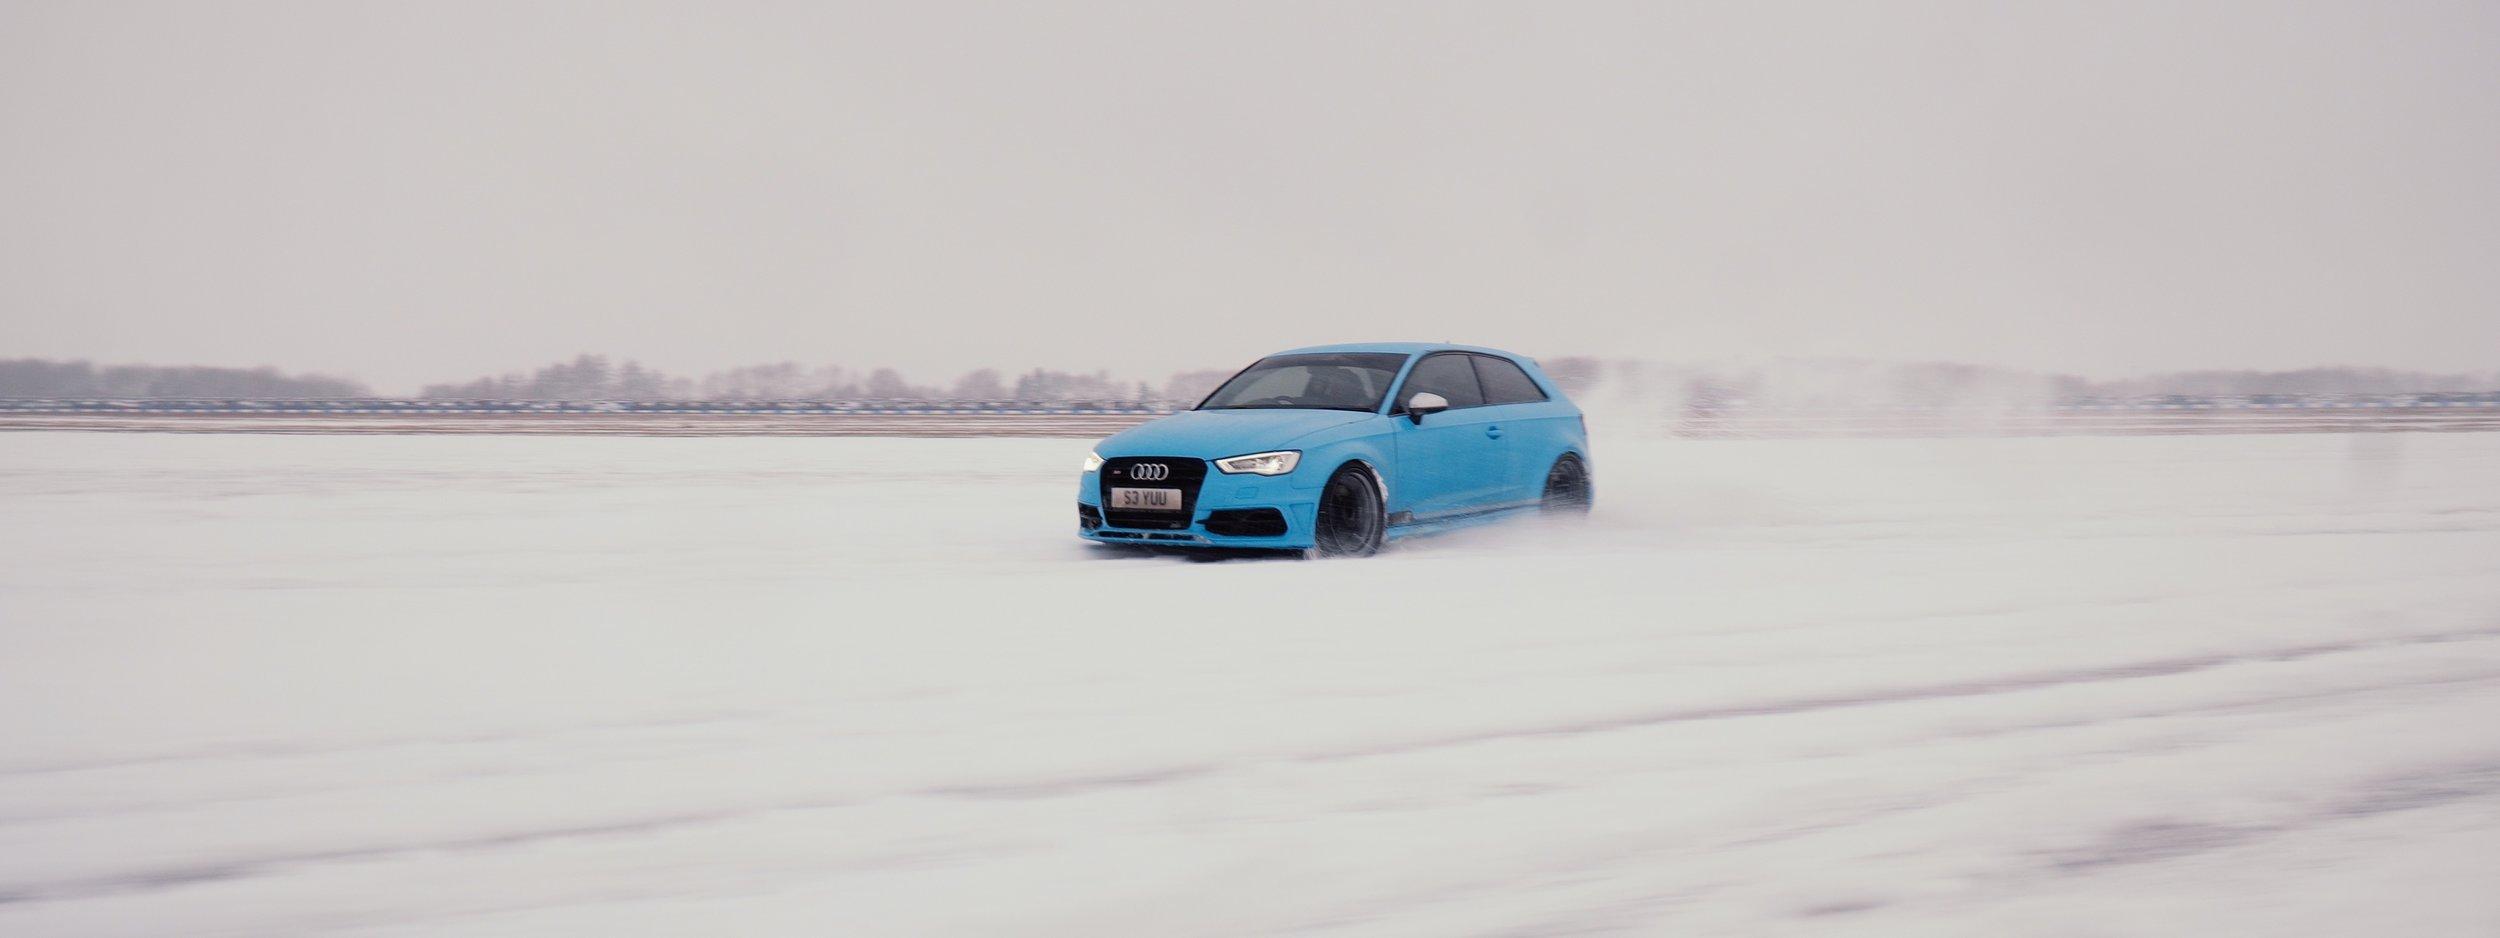 MMR AUDI S3 | SNOW DAY sc3.jpg